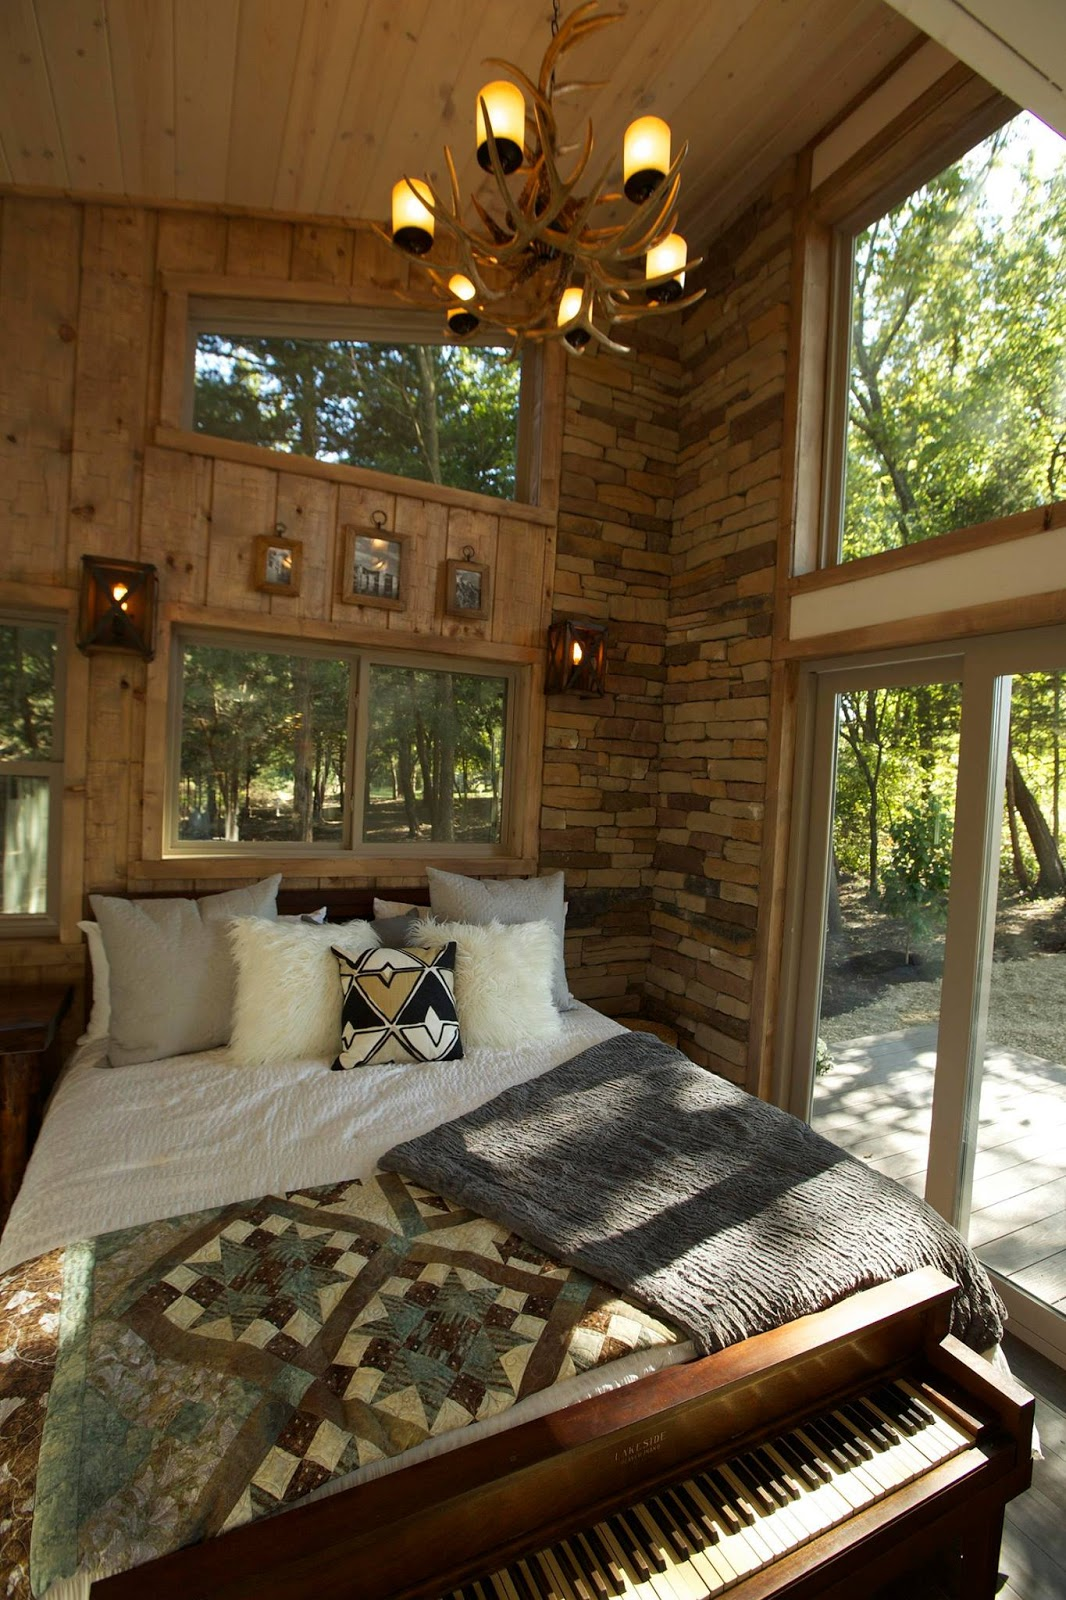 The Little Living Blog Sevens Company Cabin 545 Sq Ft